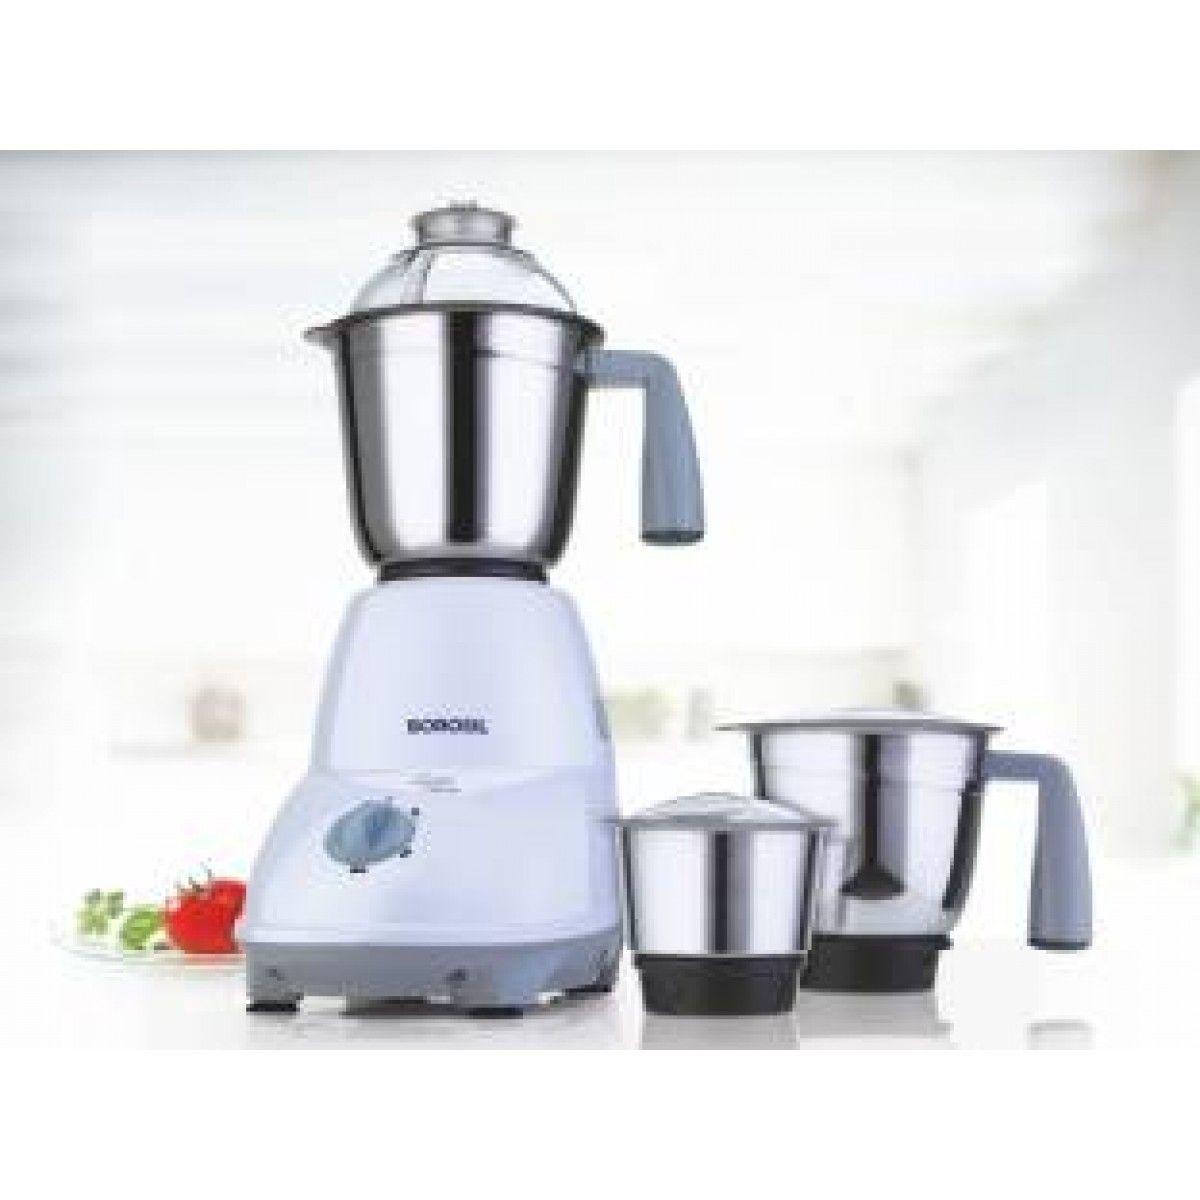 Borosil super 550 w mixer grinderwhite grey 3 jars